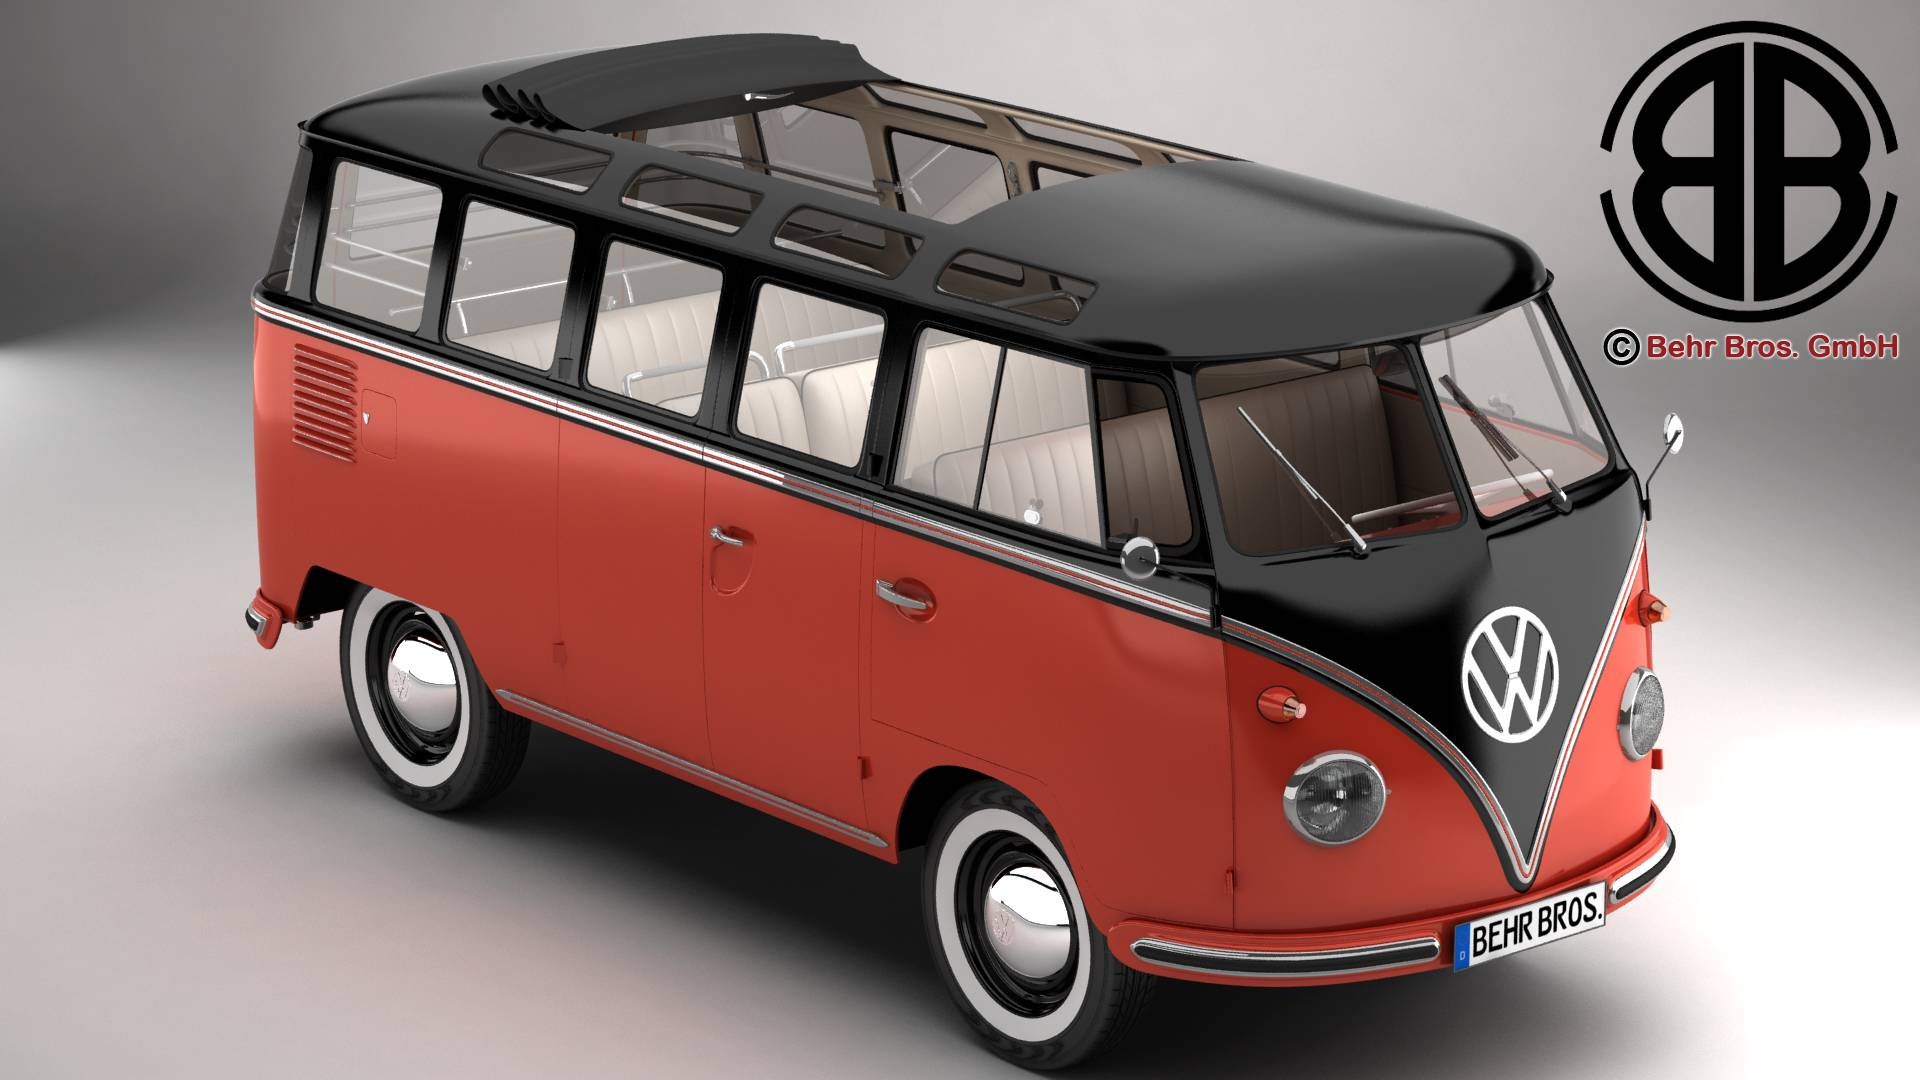 volkswagen tipas 2 samba 1959 3d modelis 3ds max fbx c4d lwo ma mb obj 217104